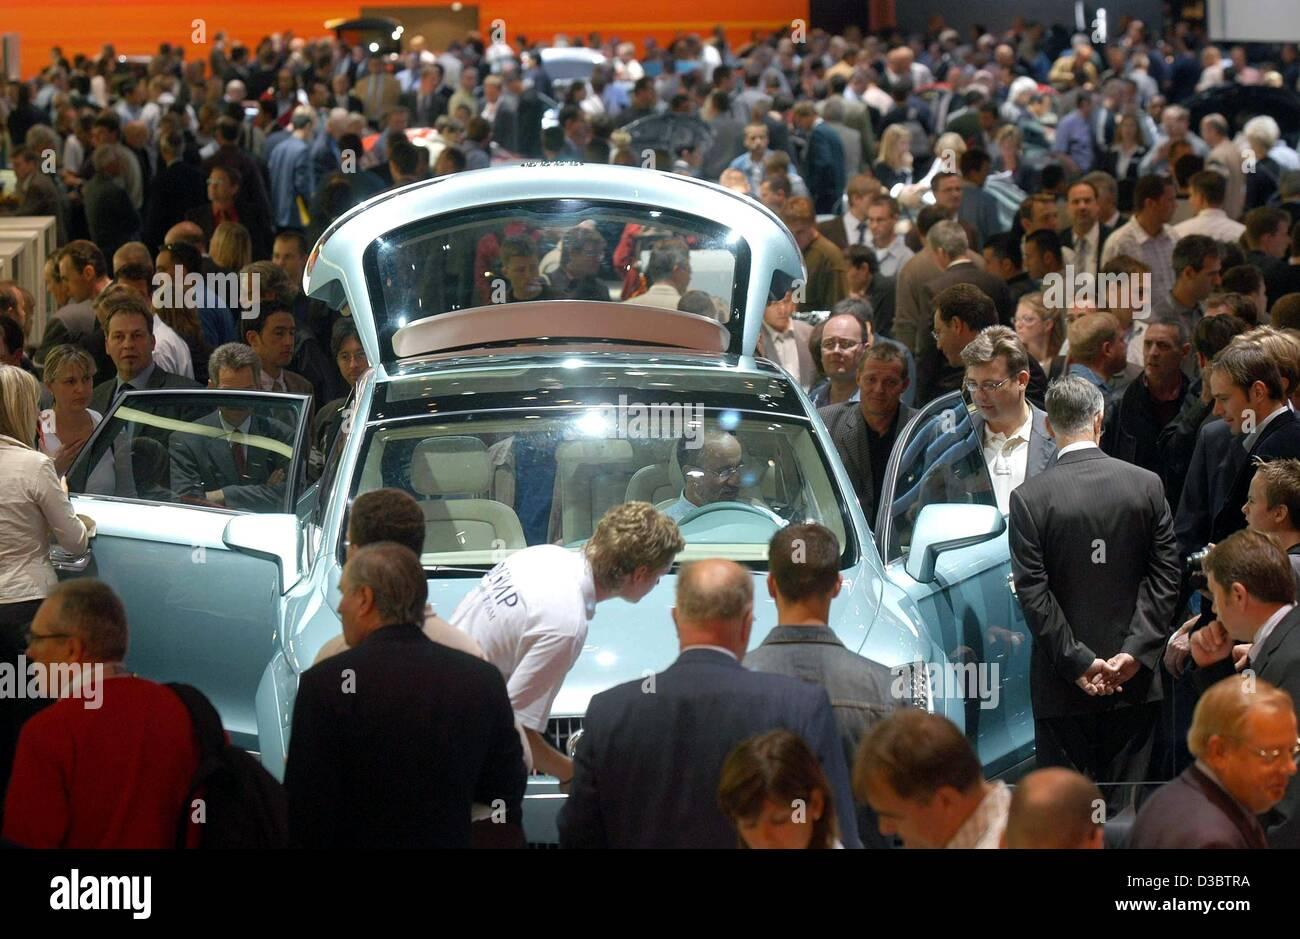 Audi Cars Audi Stand Auto Stock Photos Amp Audi Cars Audi